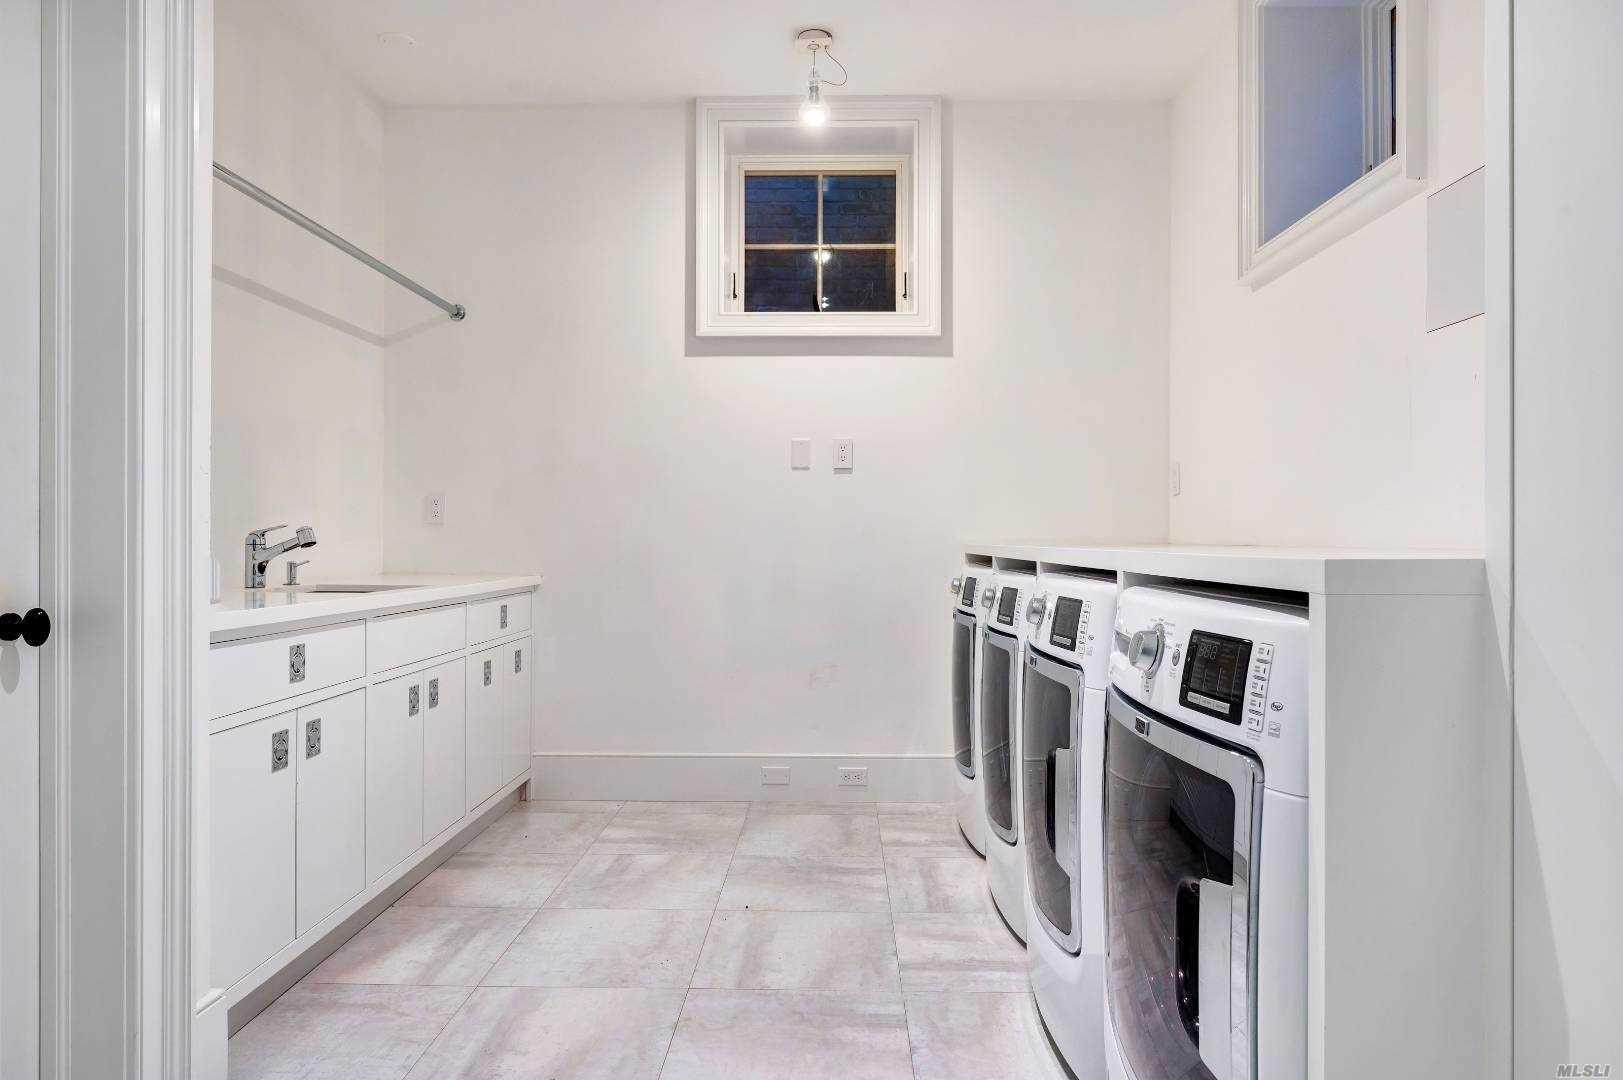 33 Linden Lane, Southampton, NY  Southampton, NY 11968